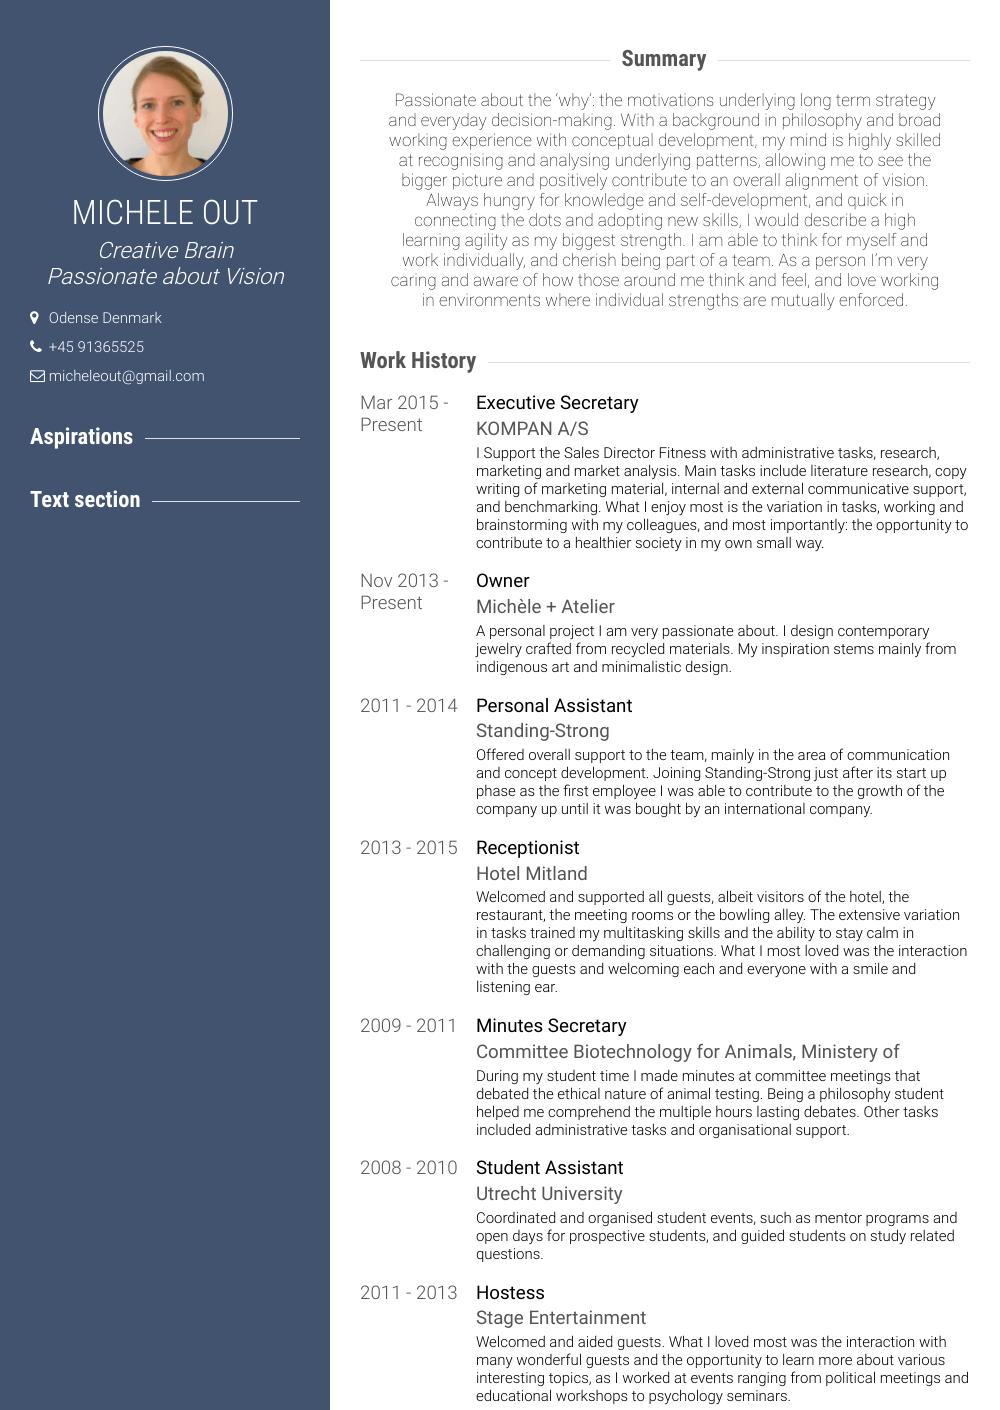 Executive Secretary  Resume Samples and Templates  VisualCV